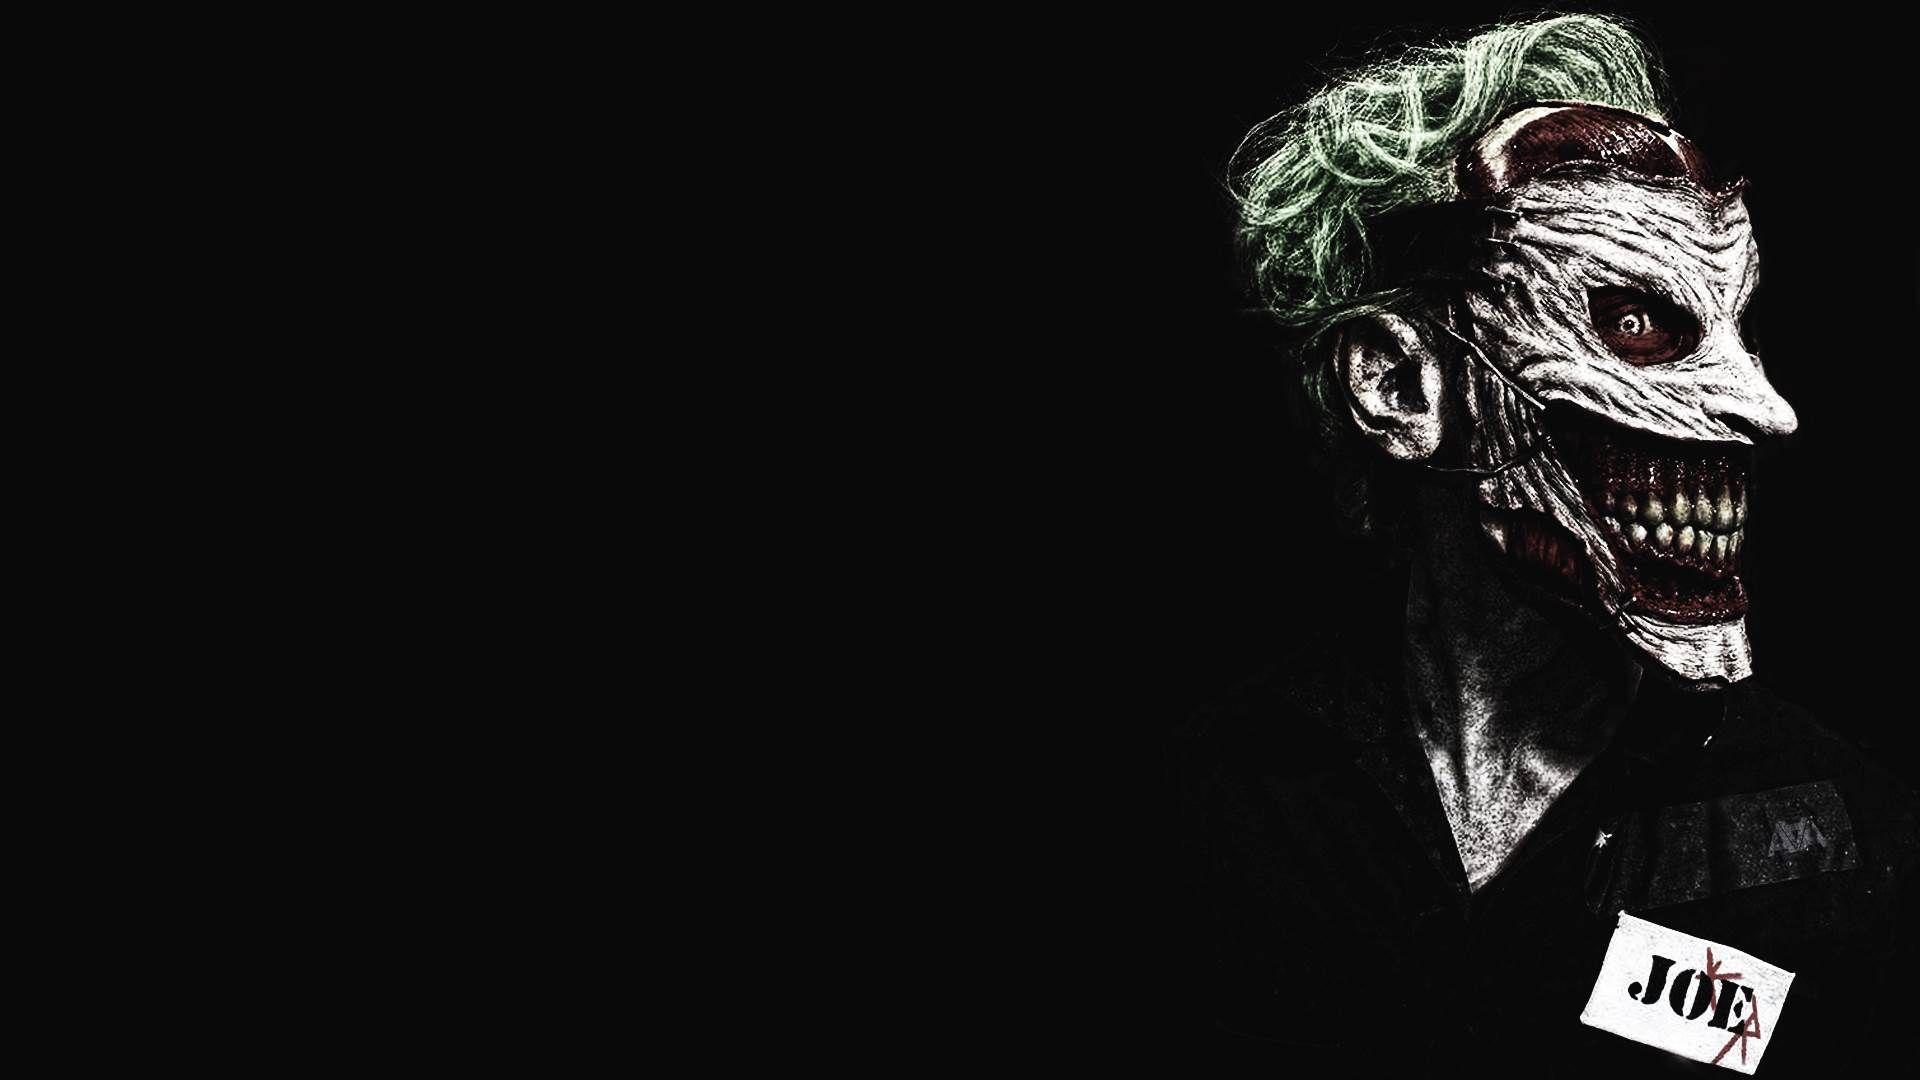 The Joker Wallpapers 1920 1080 Joker Images Adorable Wallpapers The Joker Heath Ledger Joker Gambar Keren